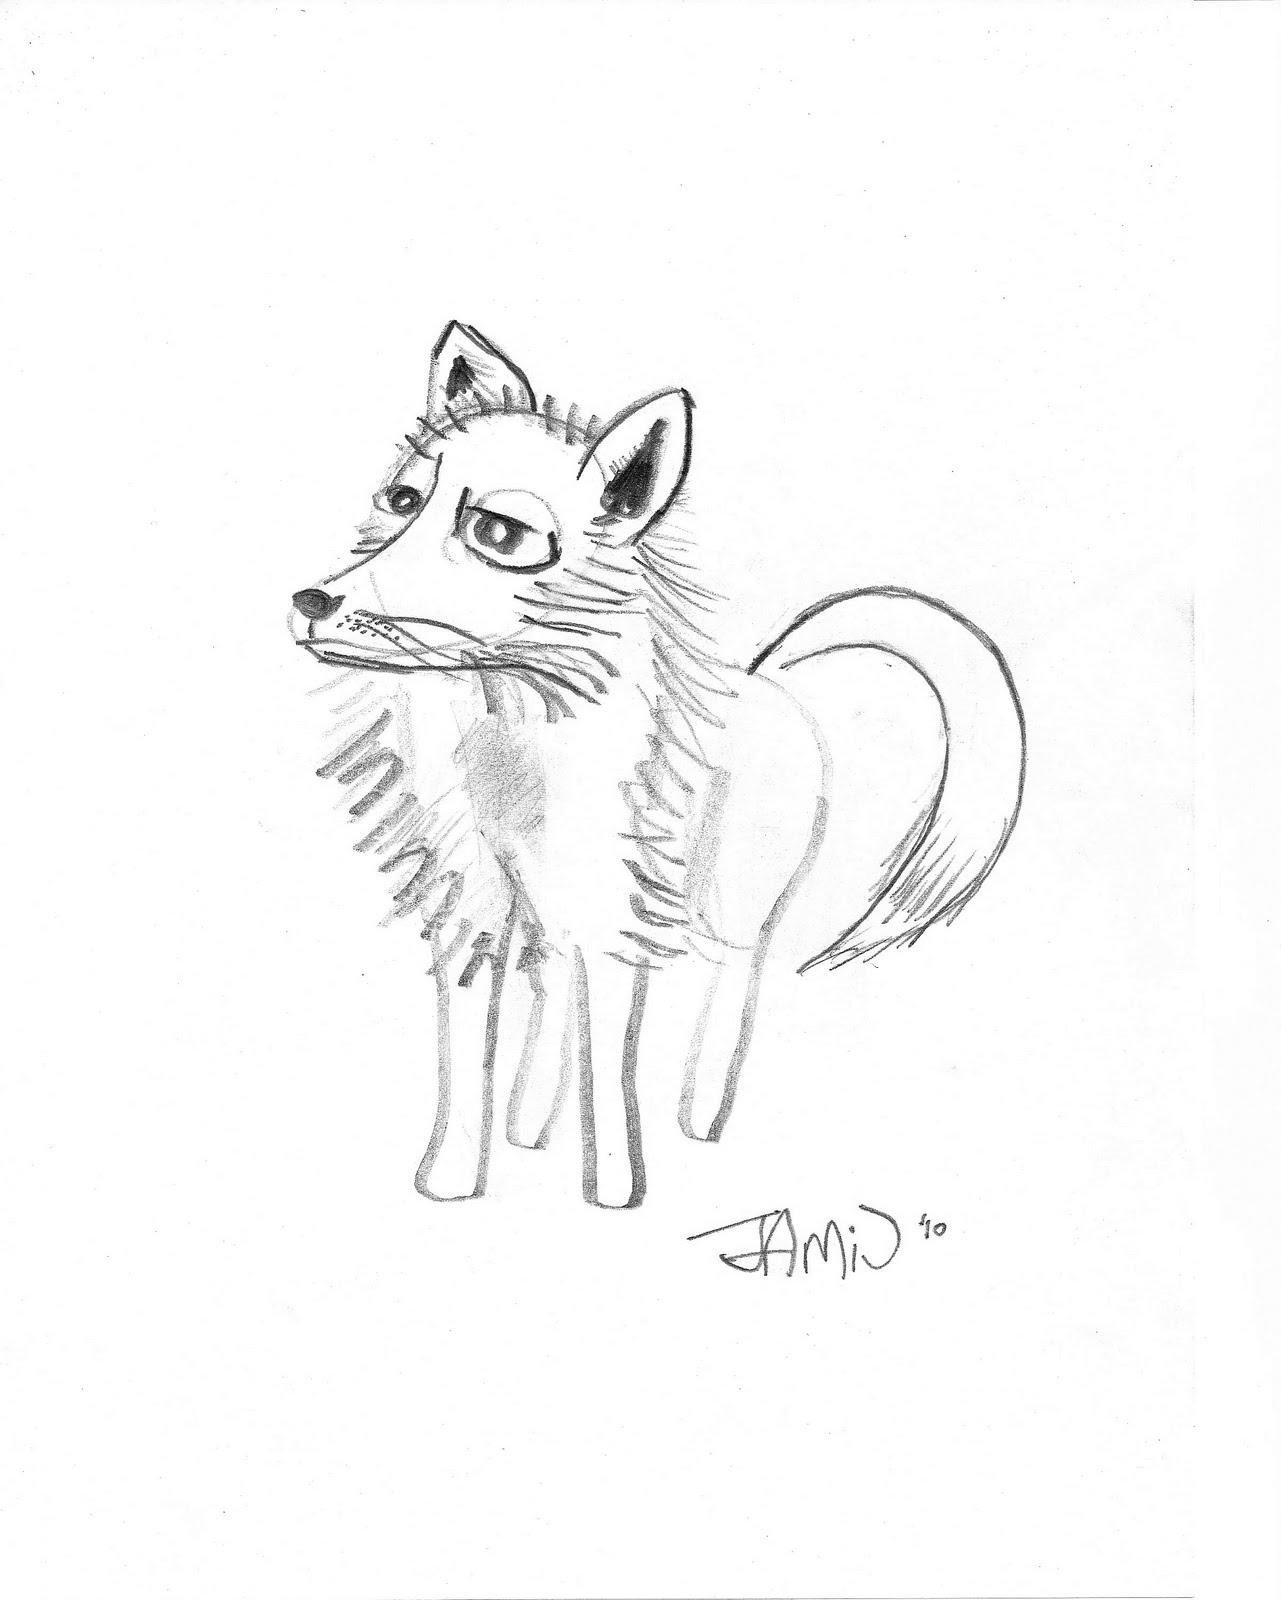 Q-Bump: THE FANTASTIC MR. FOX